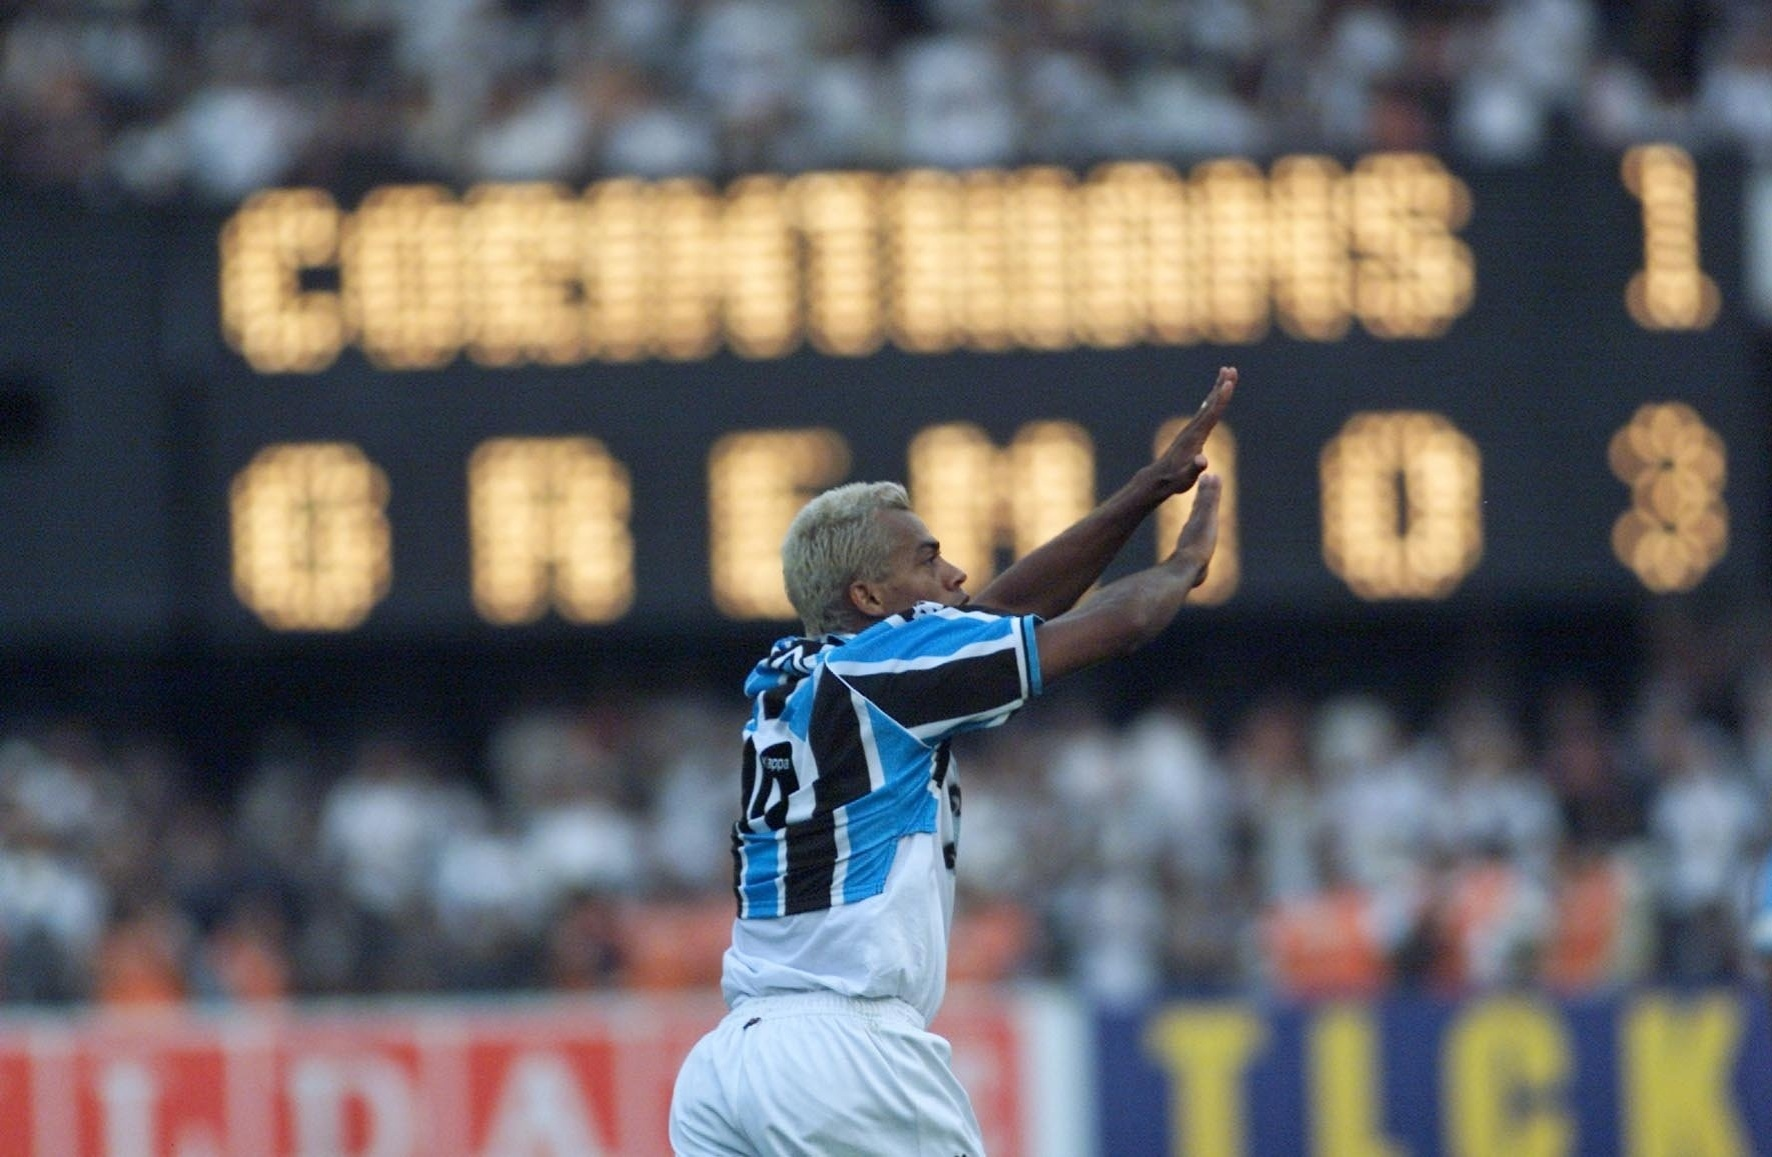 Marcelinho Paraíba, atacante do Grêmio, comemora seu gol contra o Corinthians na final da Copa do Brasil de 2001